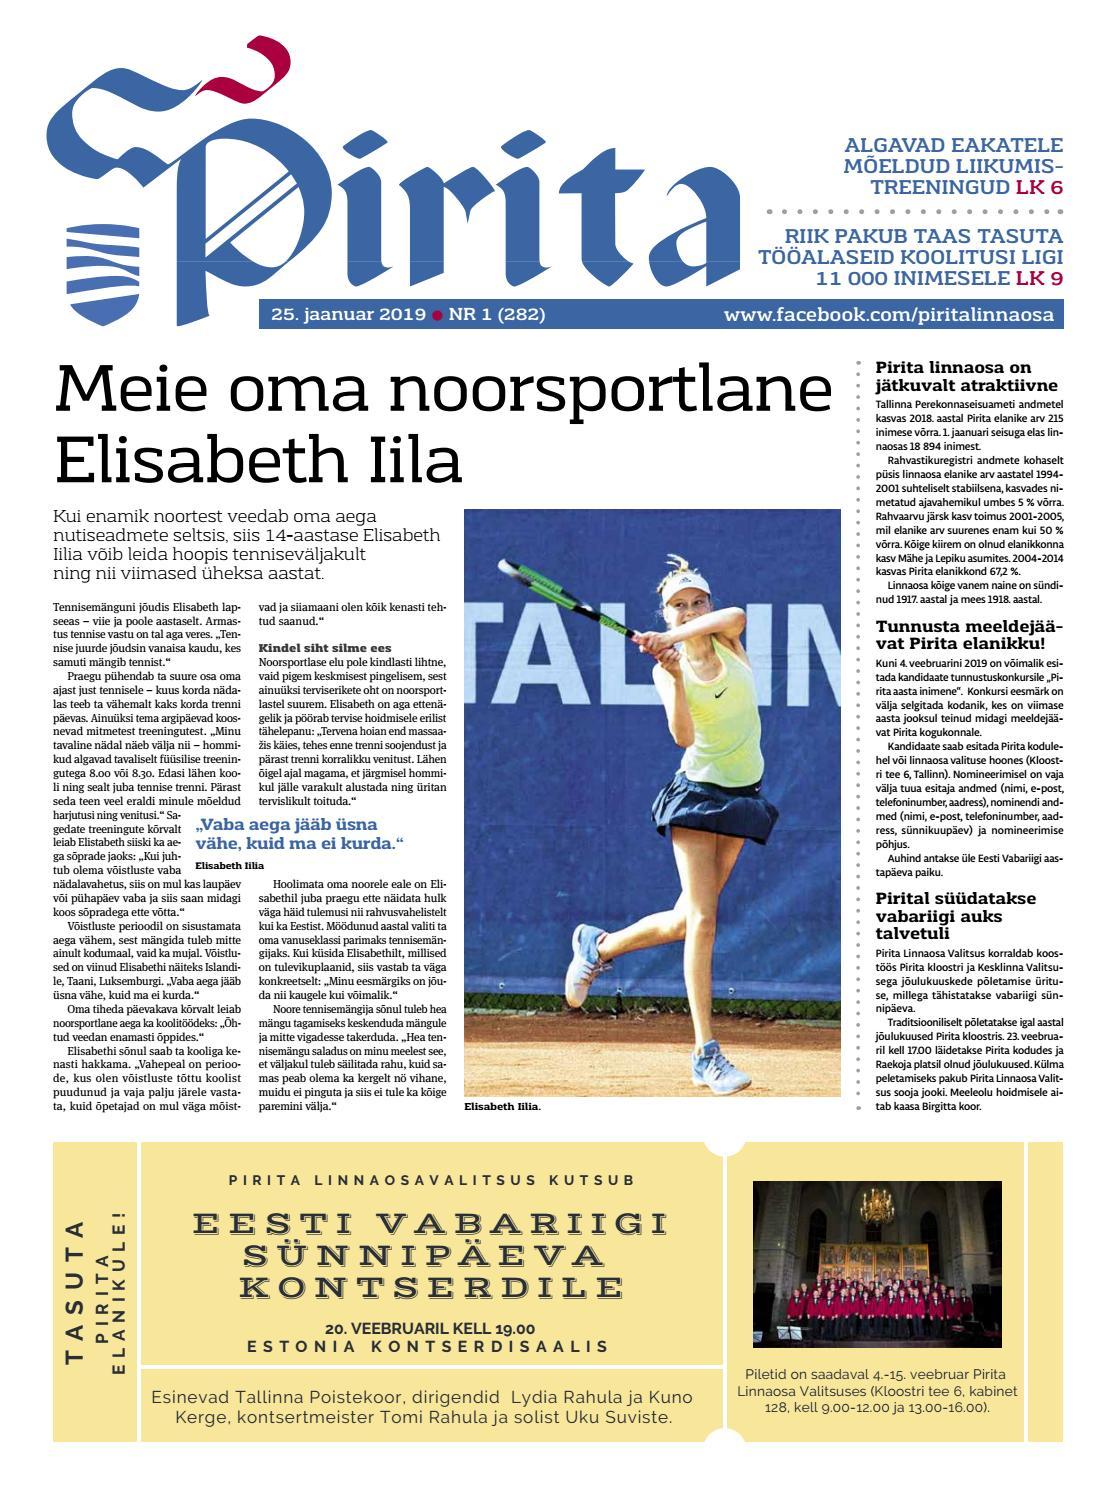 1d565a74331 Pirita ajaleht 25.01.2019 by Piritalinnaosavalitsus - issuu